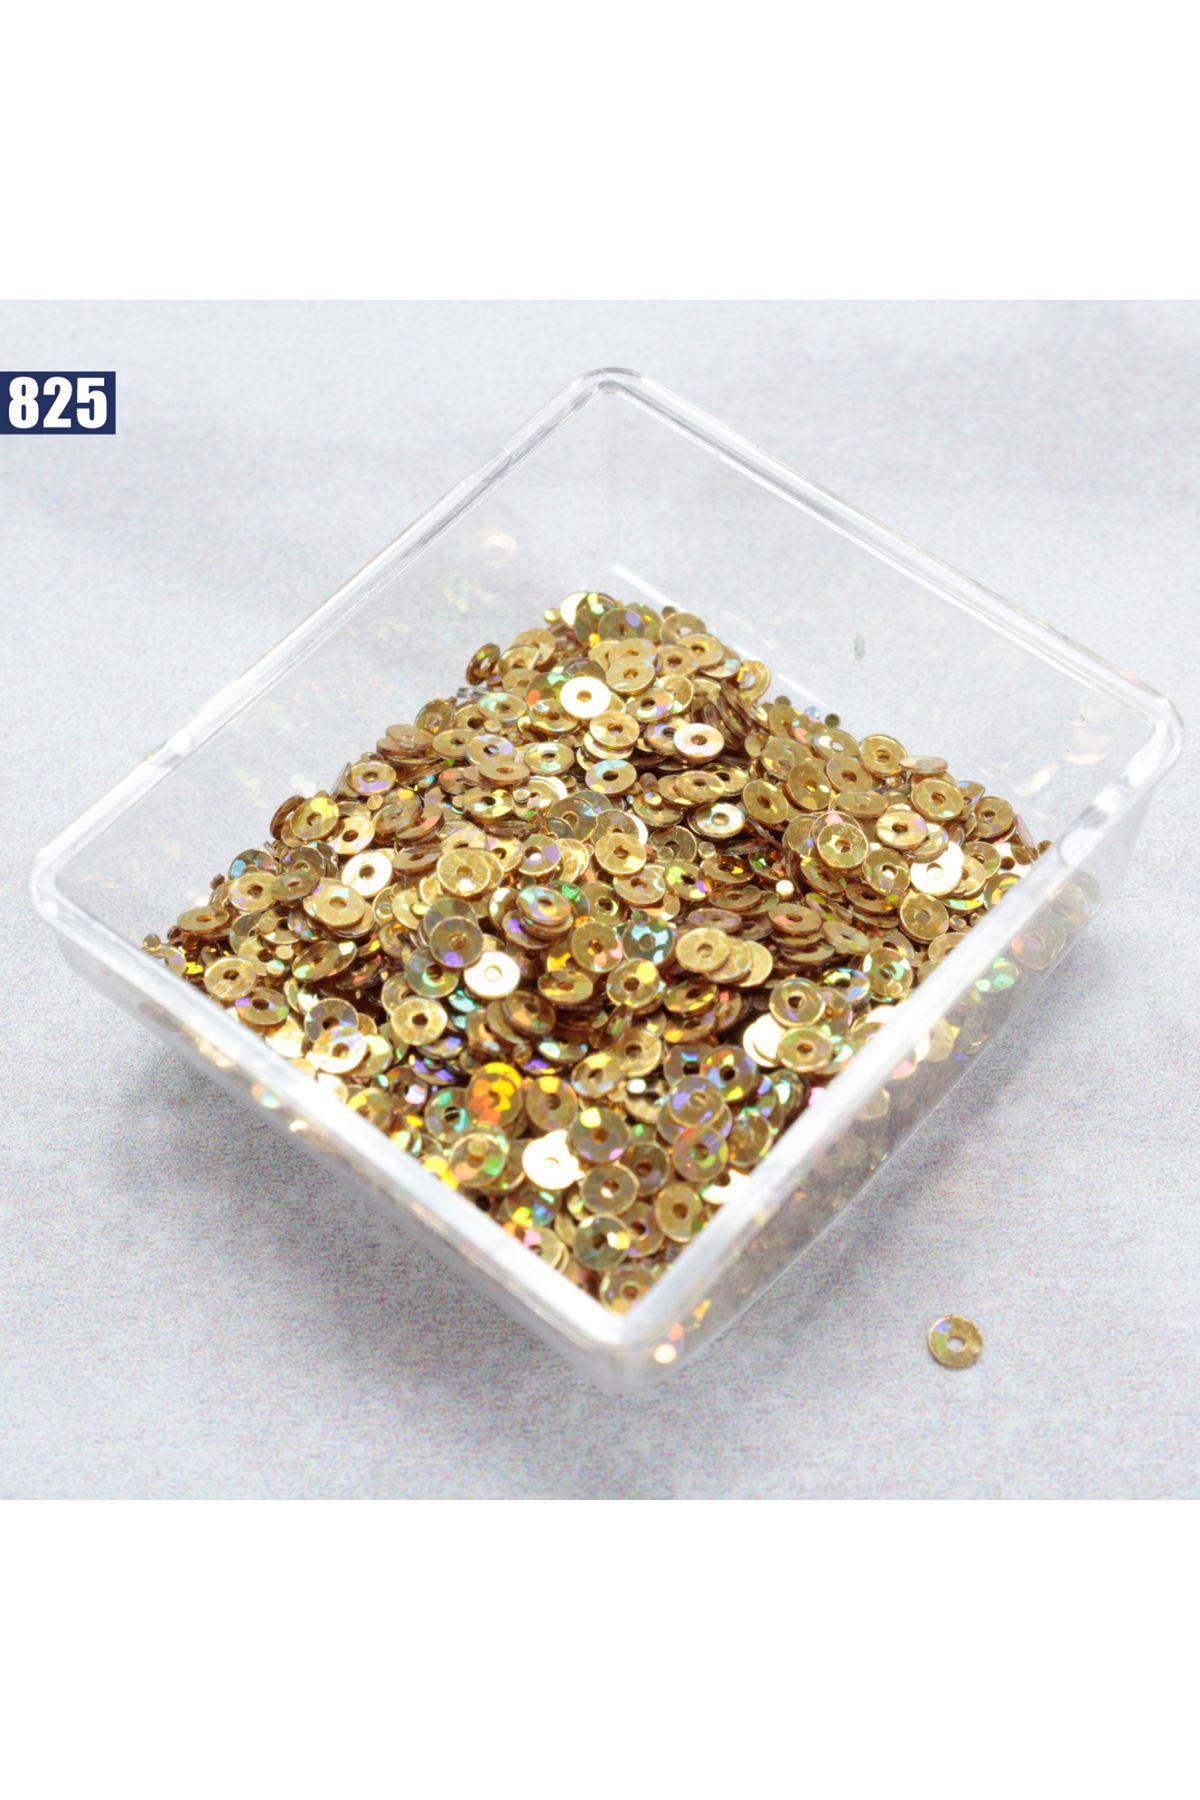 Pul 10 gram - 825